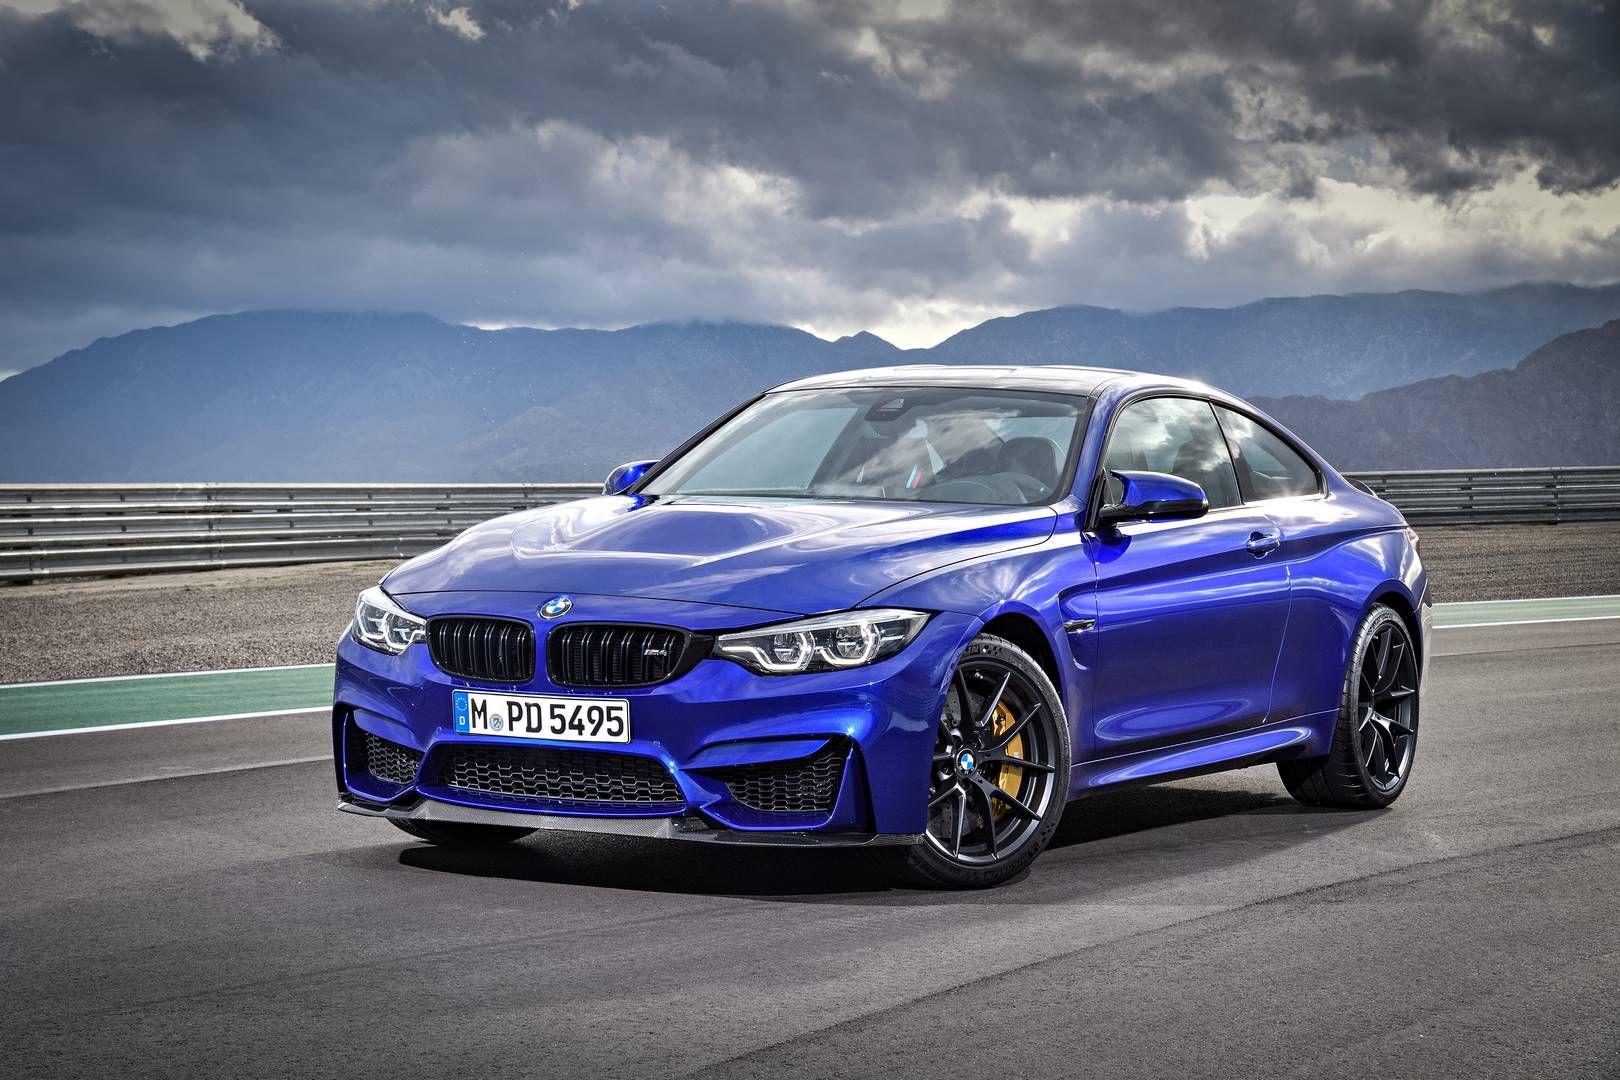 2018 BMW M4 GTS New Design Review, Price Rumors